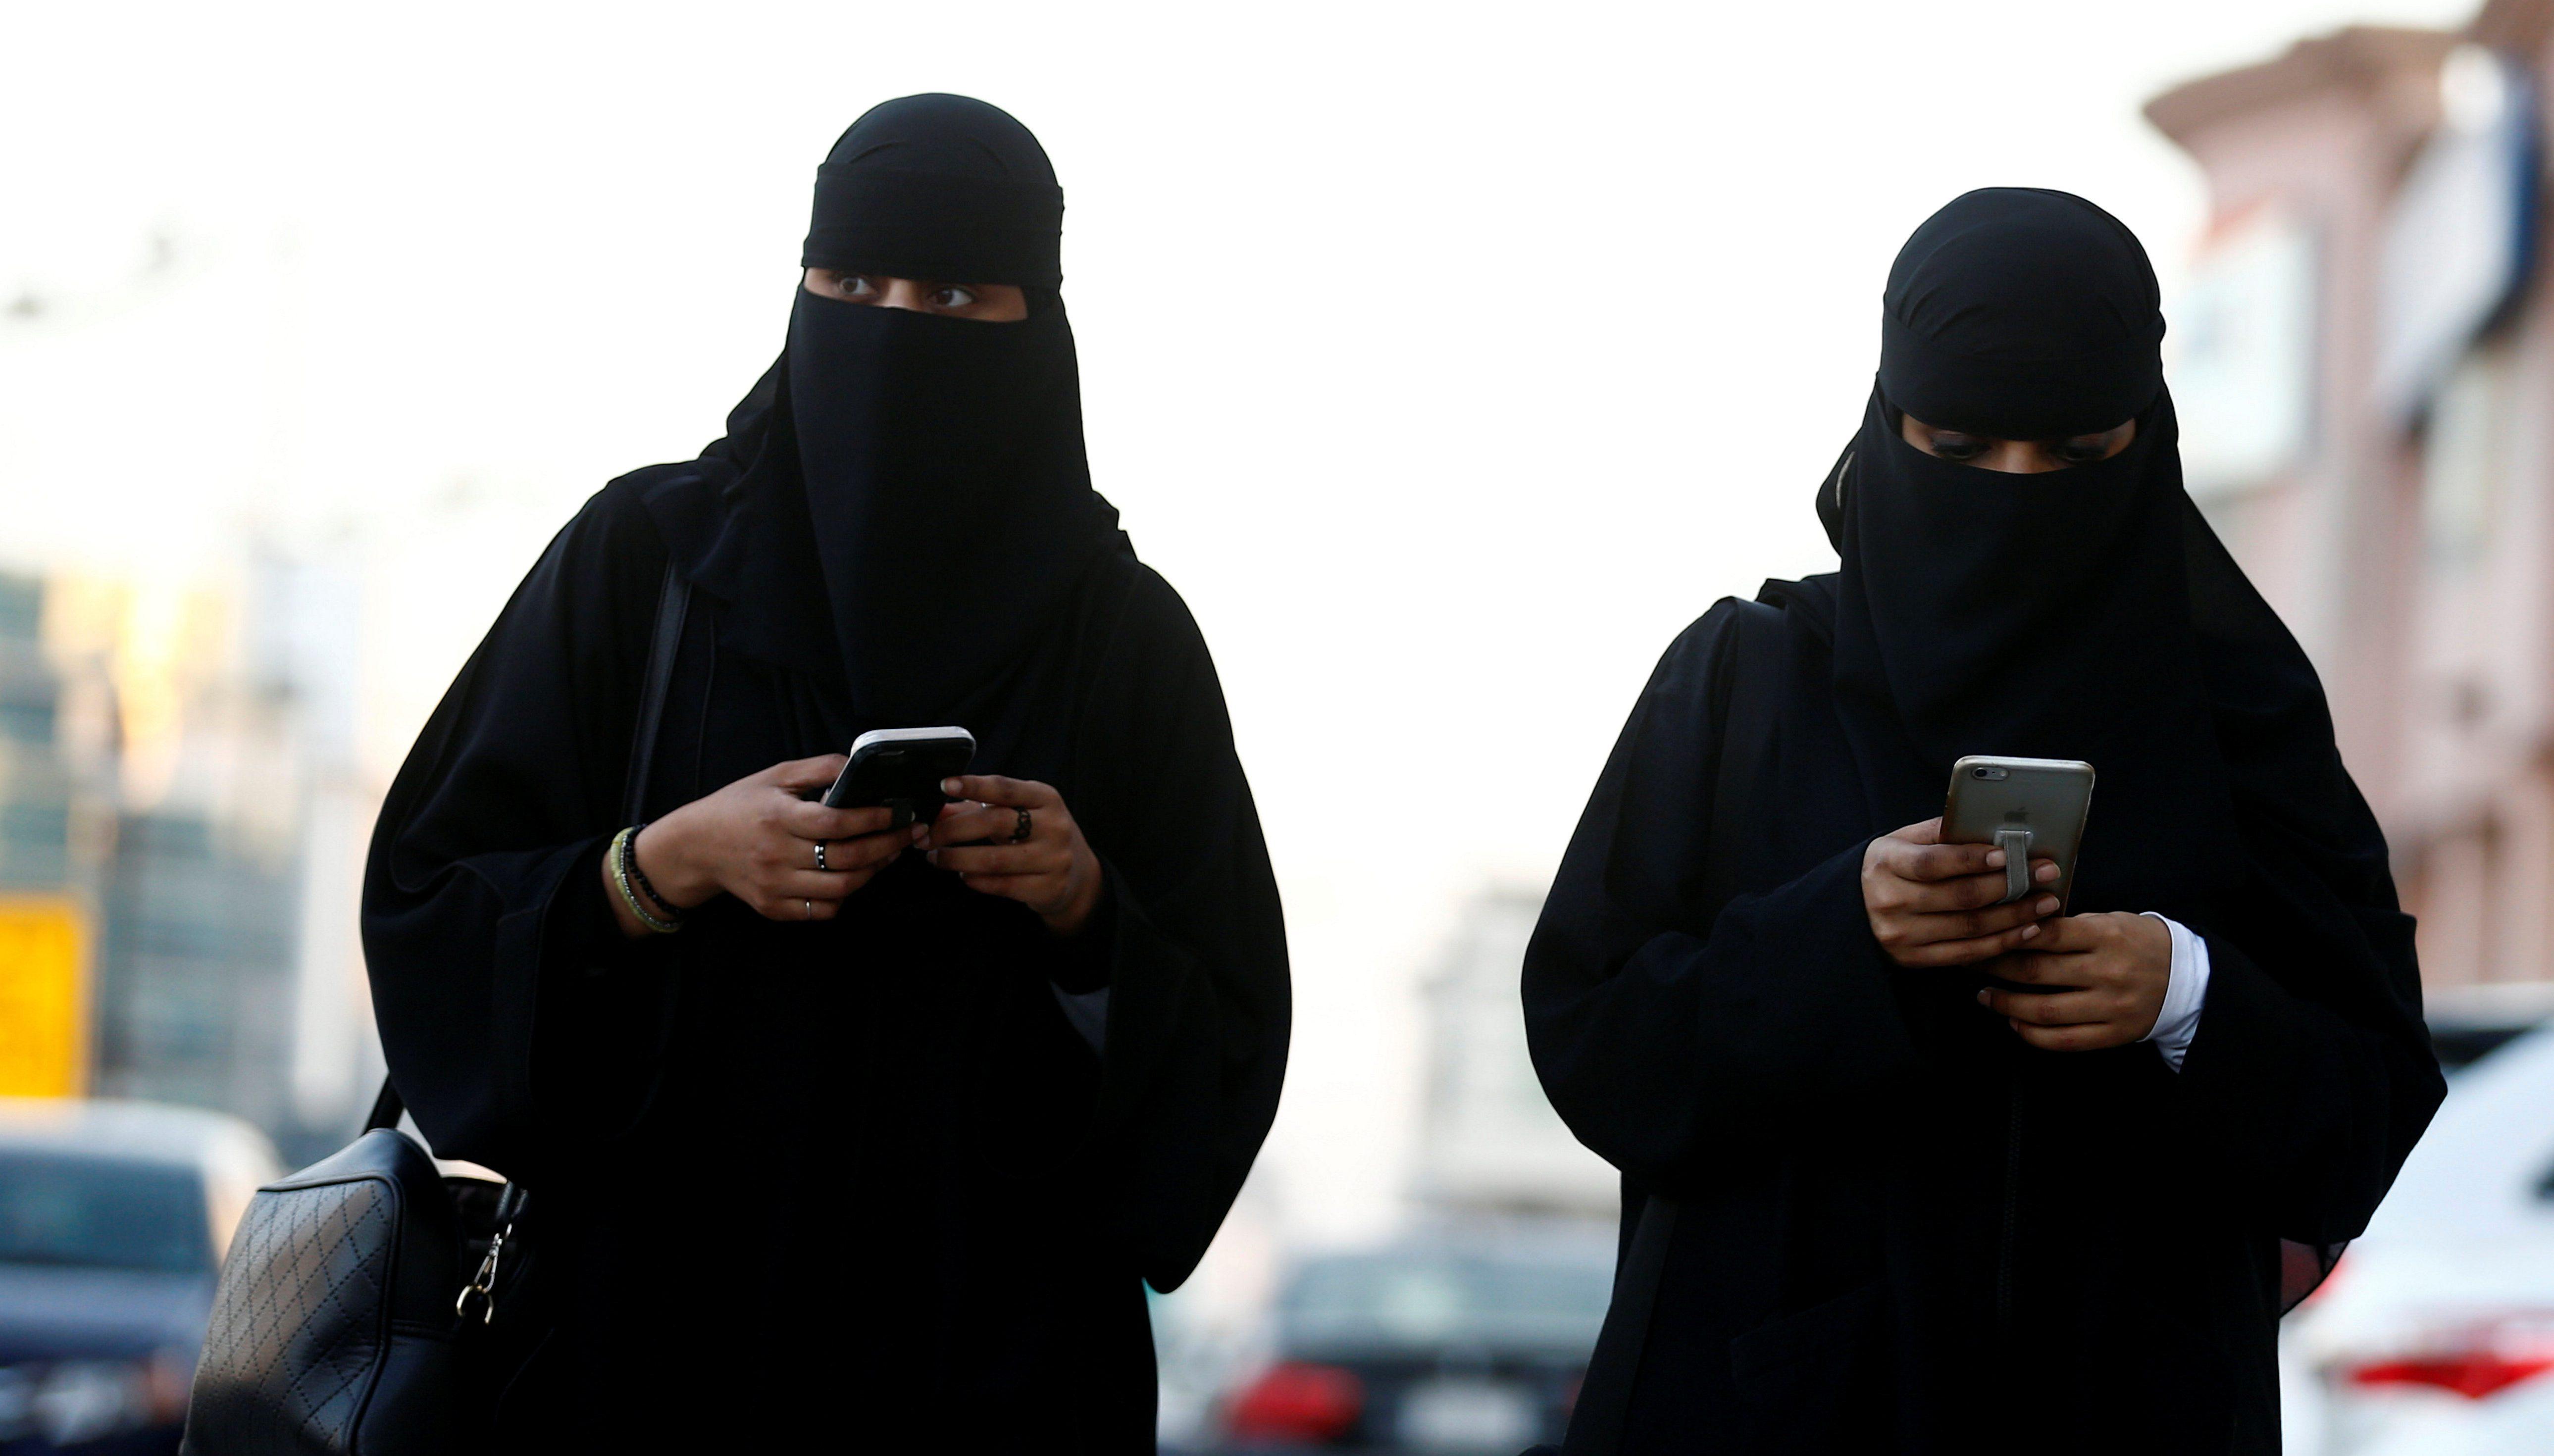 Saudi women use the Careem app on their mobile phones in Riyadh, Saudi Arabia, January 2, 2017. Picture taken January 2, 2017.